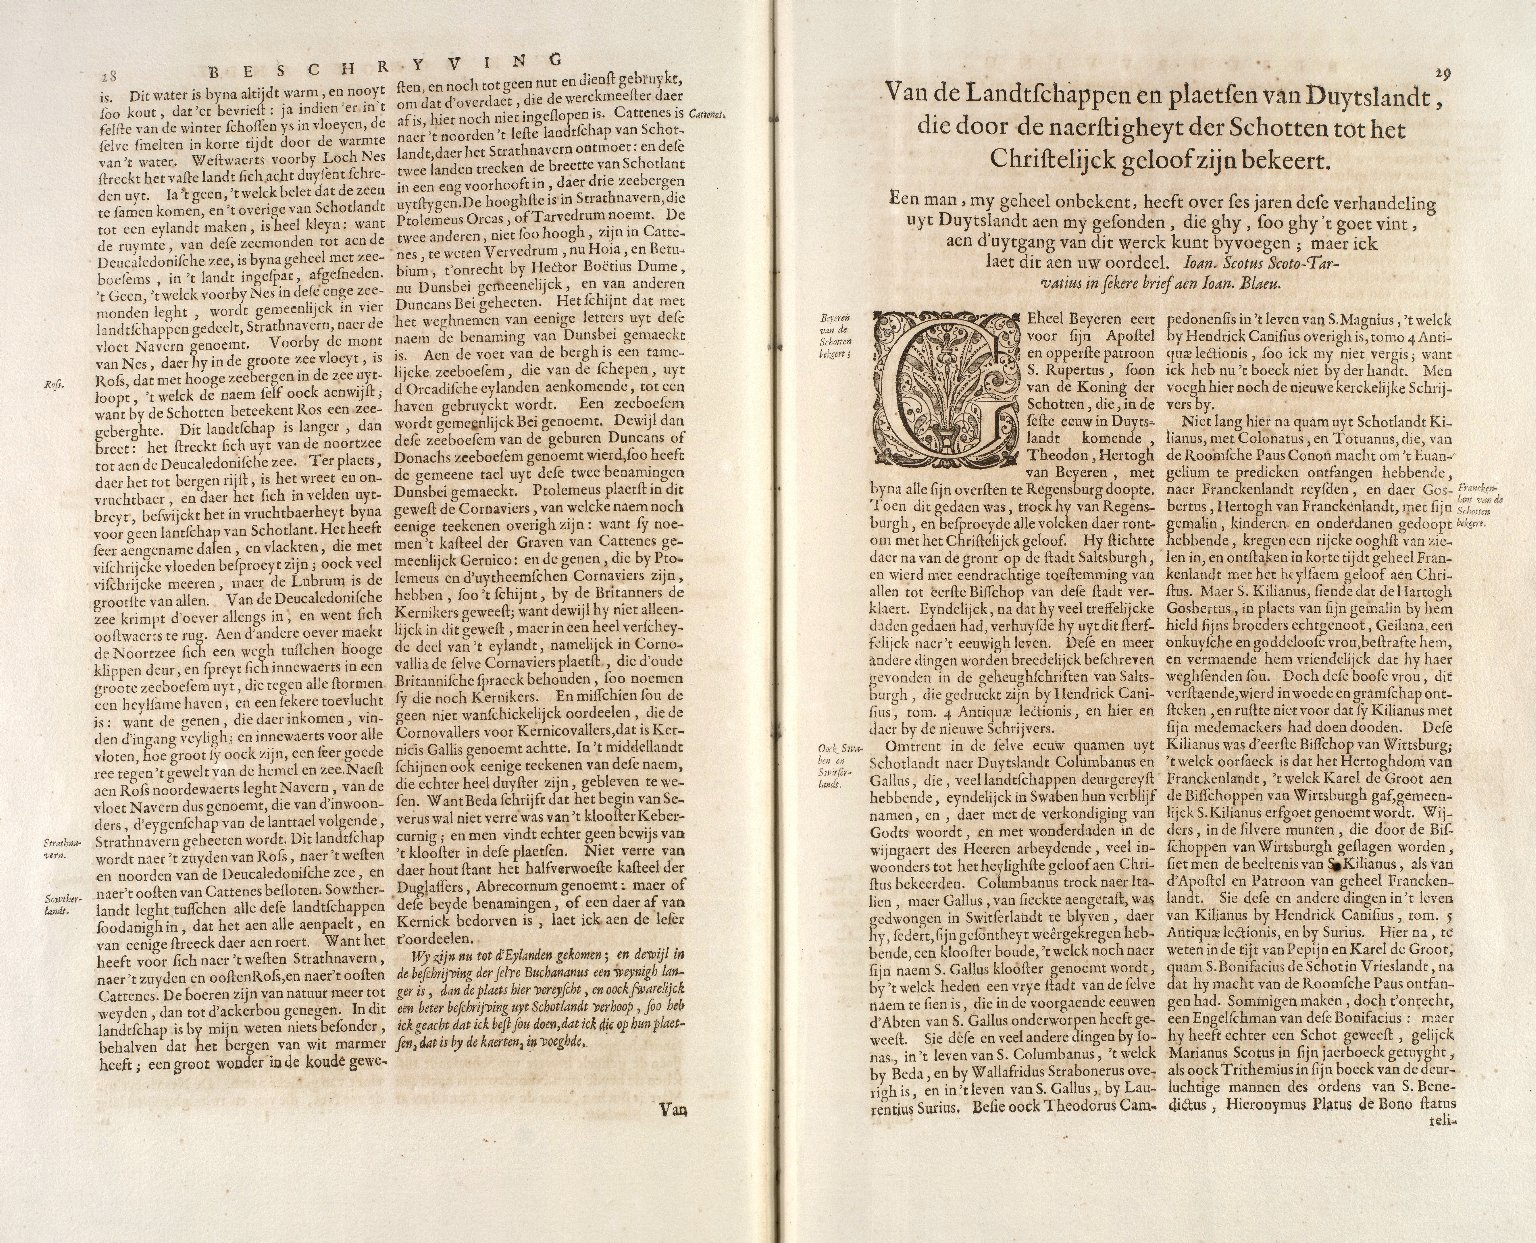 [Geographiae Blavianae] [Also known as: Atlas major] [025 of 153]